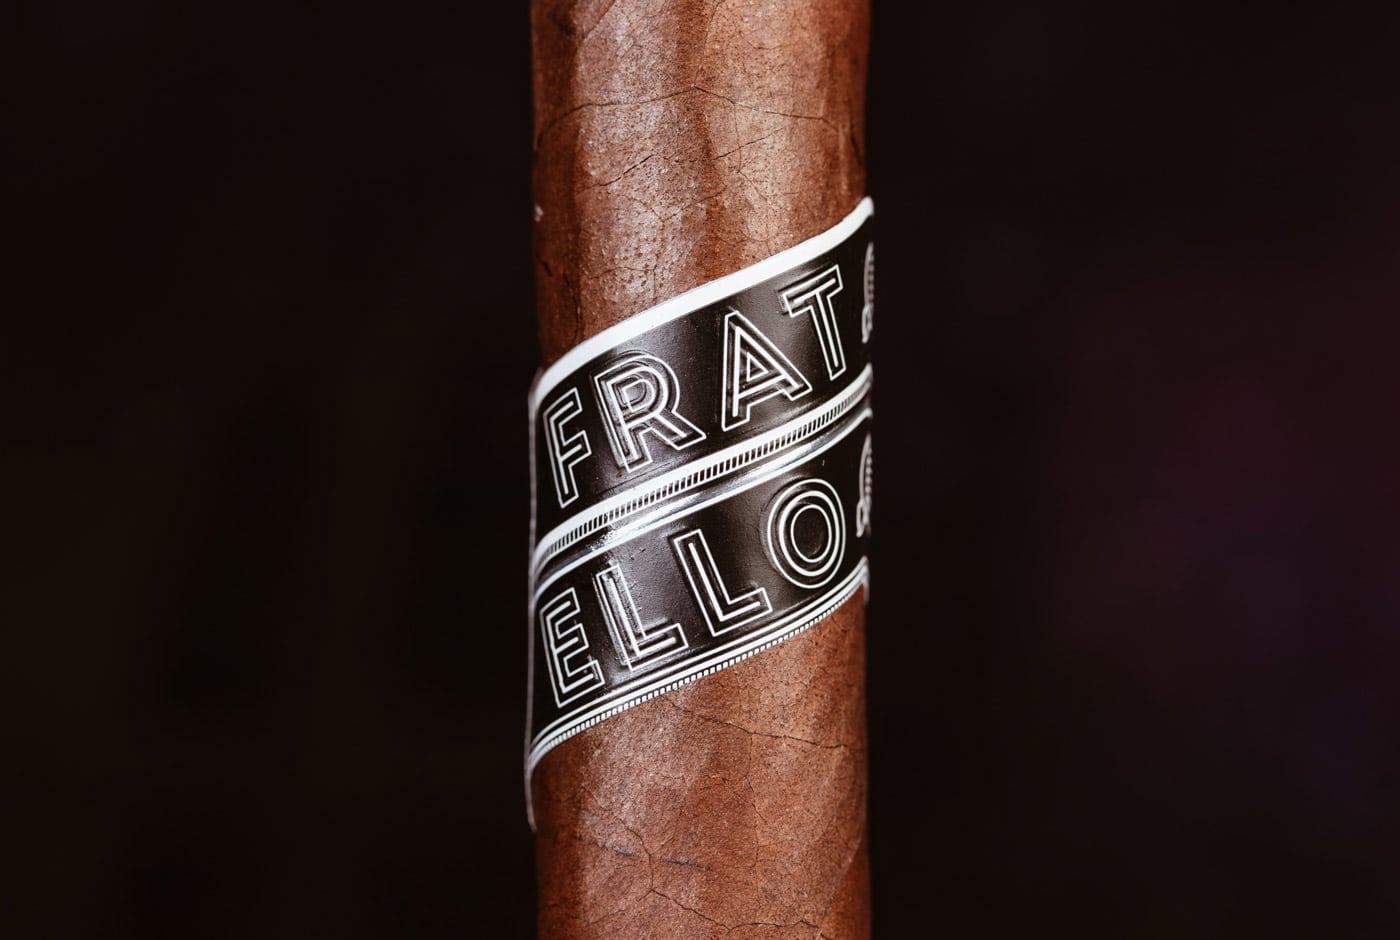 Fratello Navetta Inverso Corona Gorda cigar review